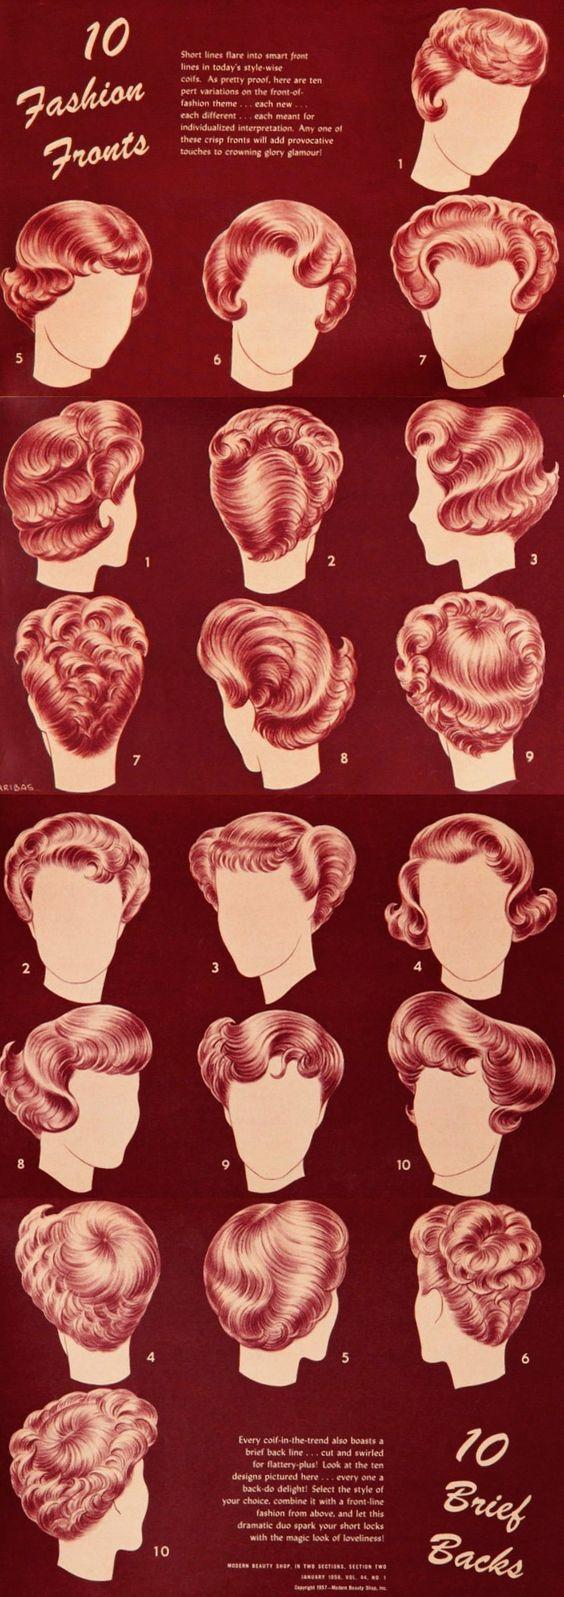 popular hairstyles 1950s | remember when. | pinterest | popular